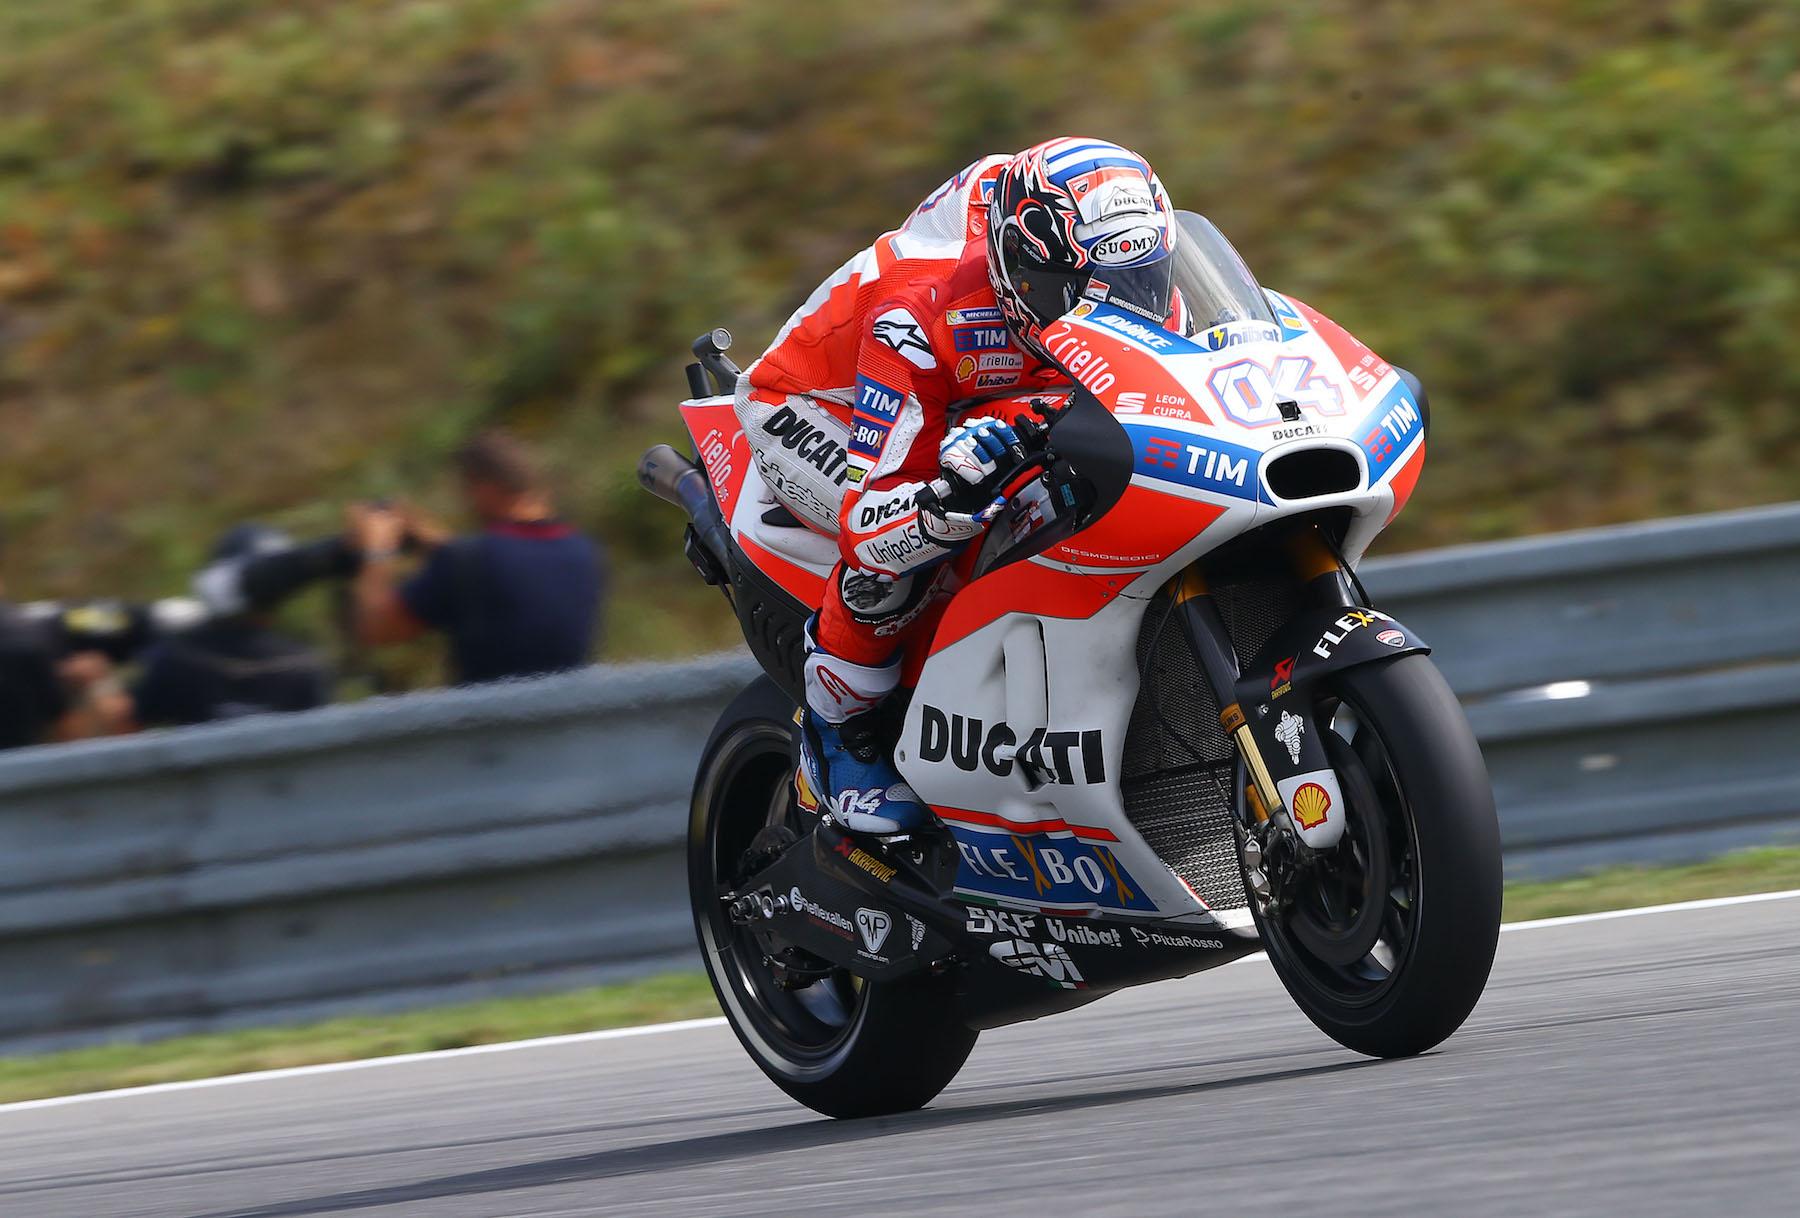 MotoGP vuelve con Andrea Dovizioso dominando en Brno